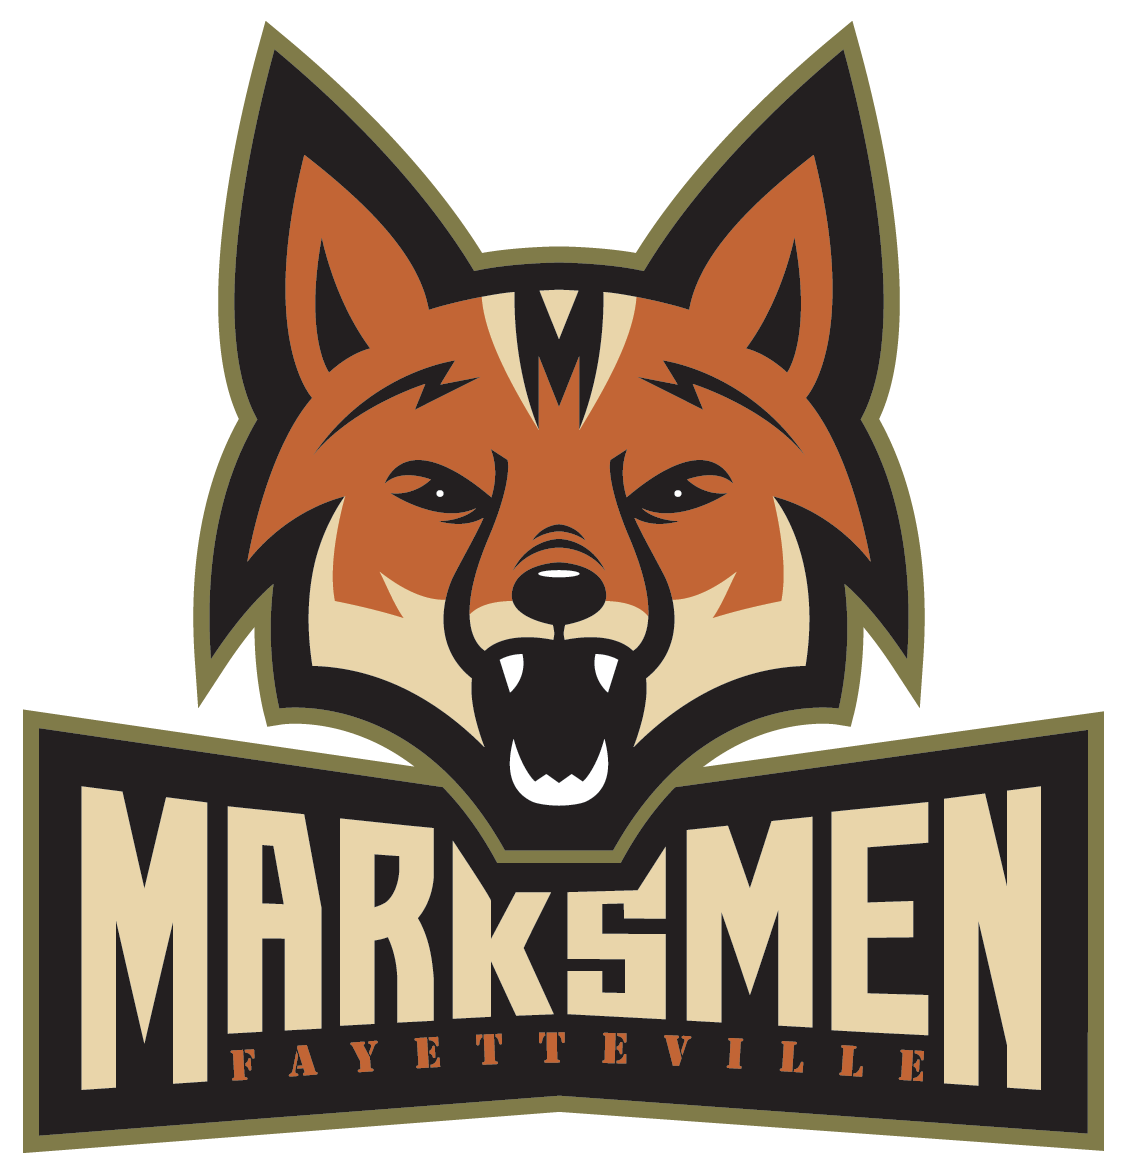 fayetteville_marksmen_2017-18